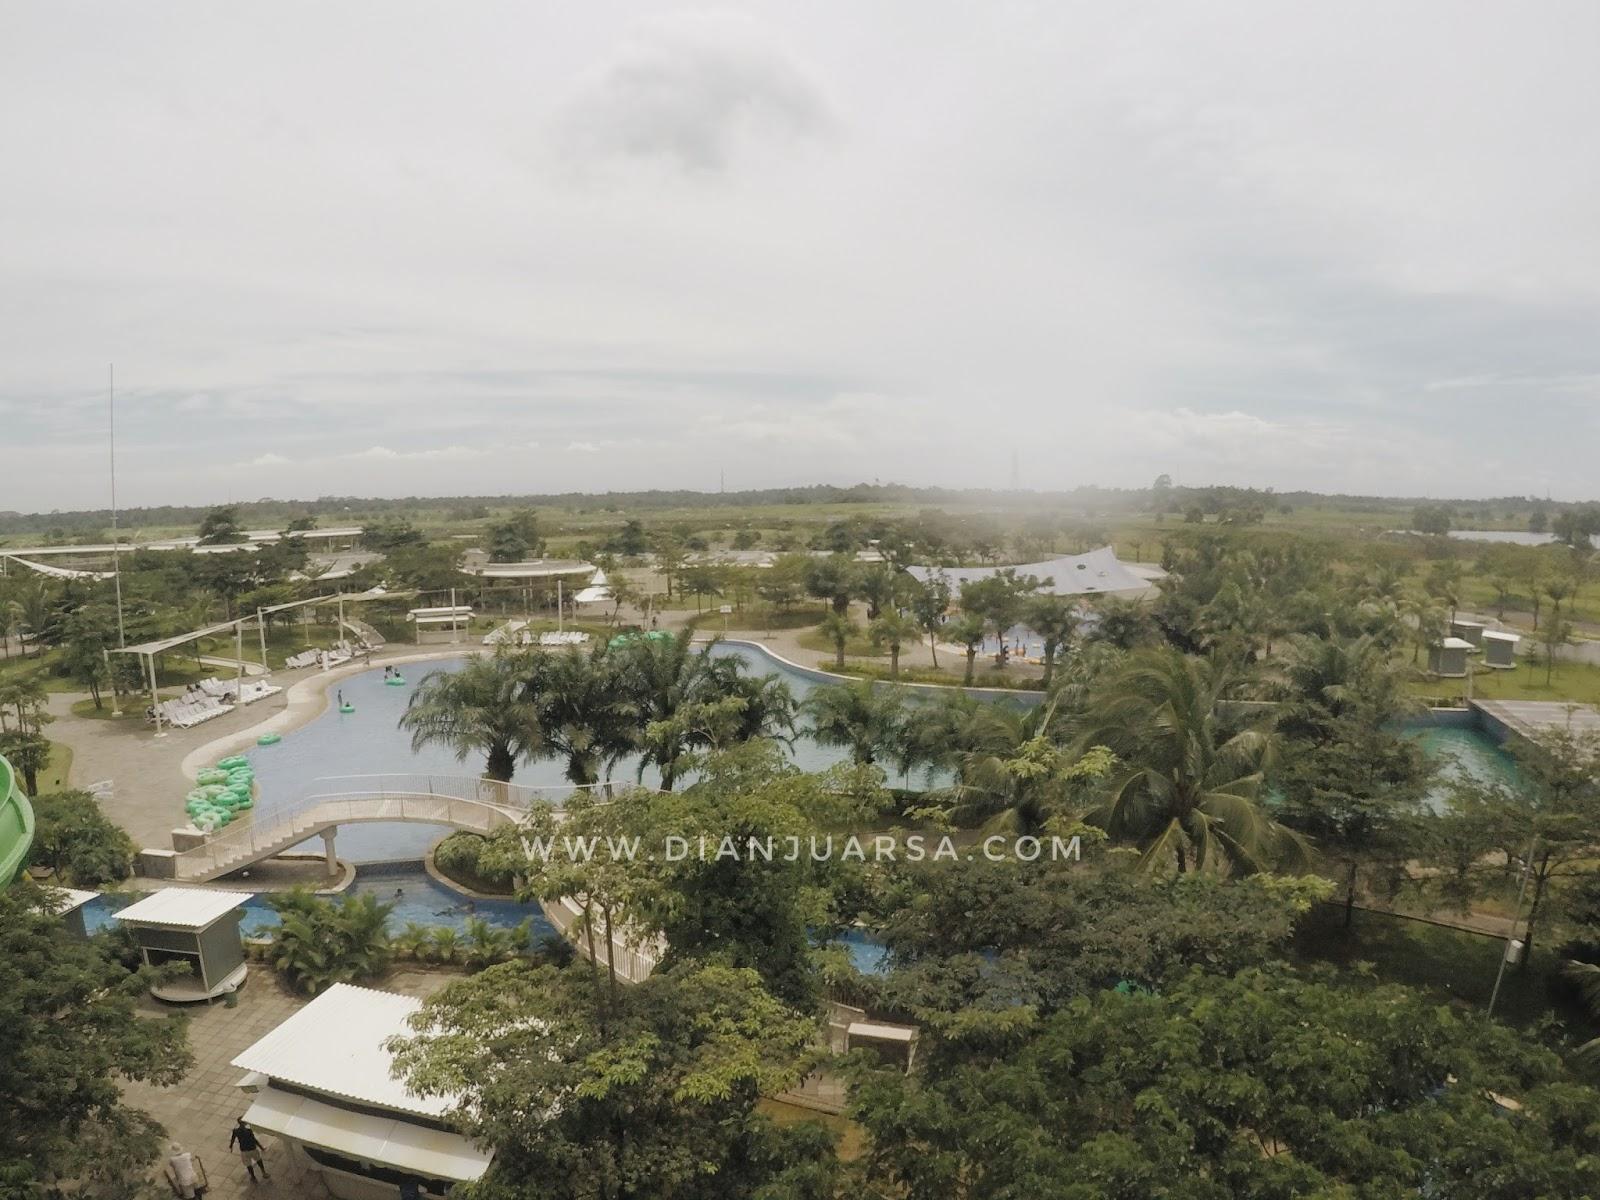 Go Wet Waterpark Grand Wisata Bekasi Untold Story Tiket Masuk Nih Saya Jabarin Yah Untuk Apa Saja Jadi Rp 100000 Nya Bayar Sewa Loker Atau Baju Renang Pembelian Makanan Minuman Selama Didalam